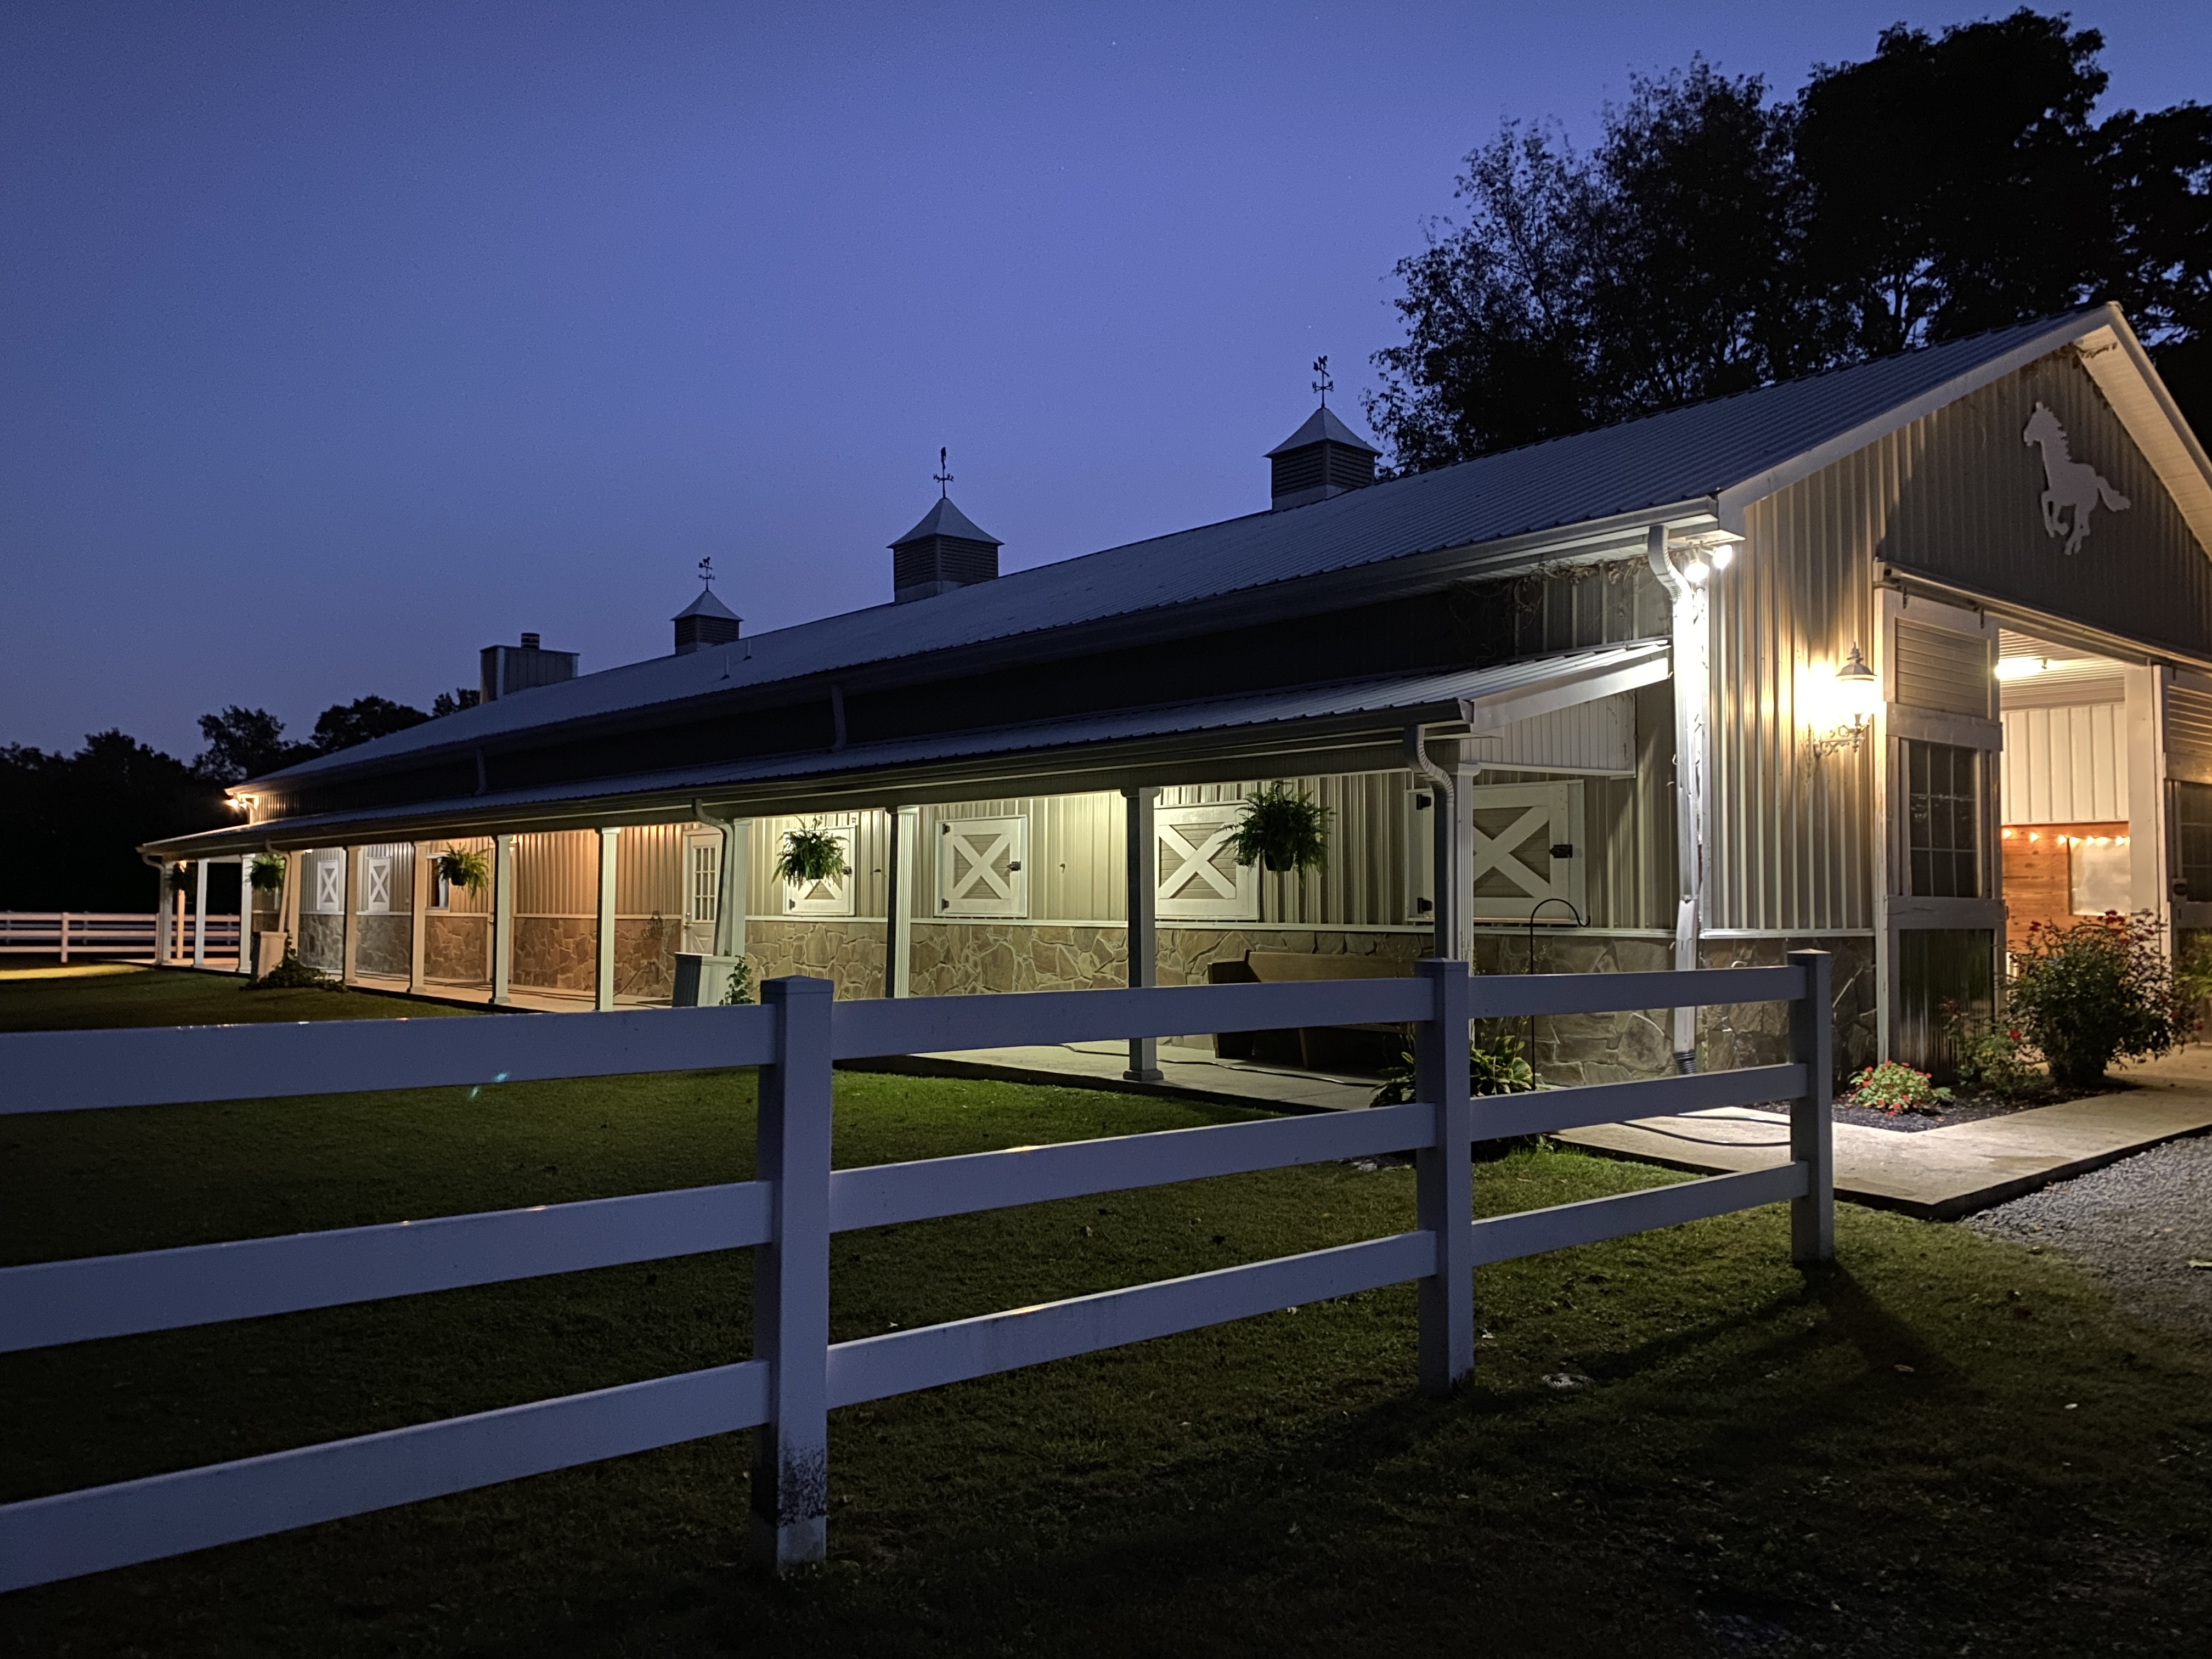 The Wild Turkey Ranch porch at night